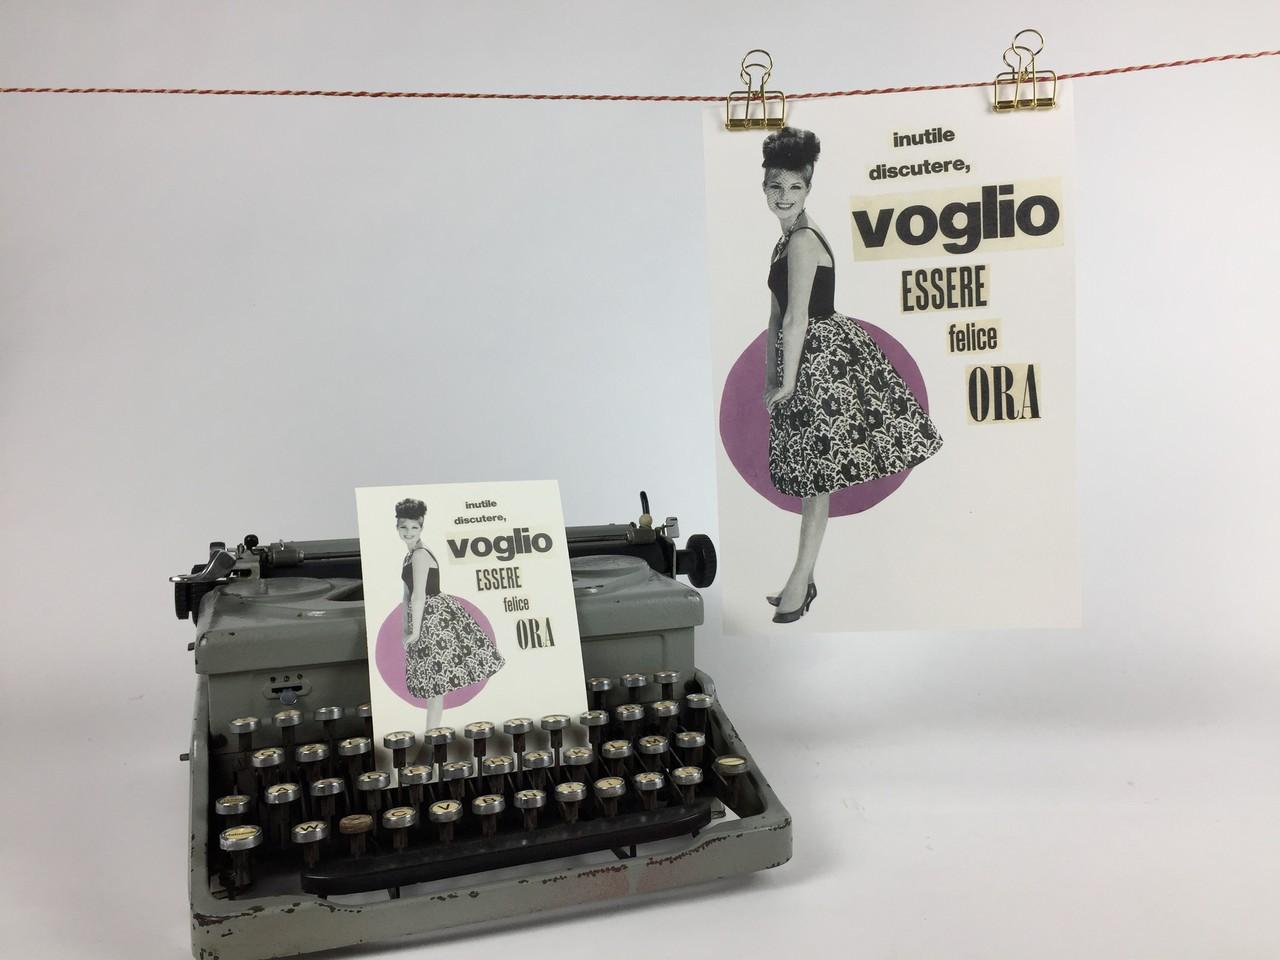 Collage Vintage / Manufatturieri / Matrioska Labstore #14 / Rimini 7-8-9 dicembre 2018